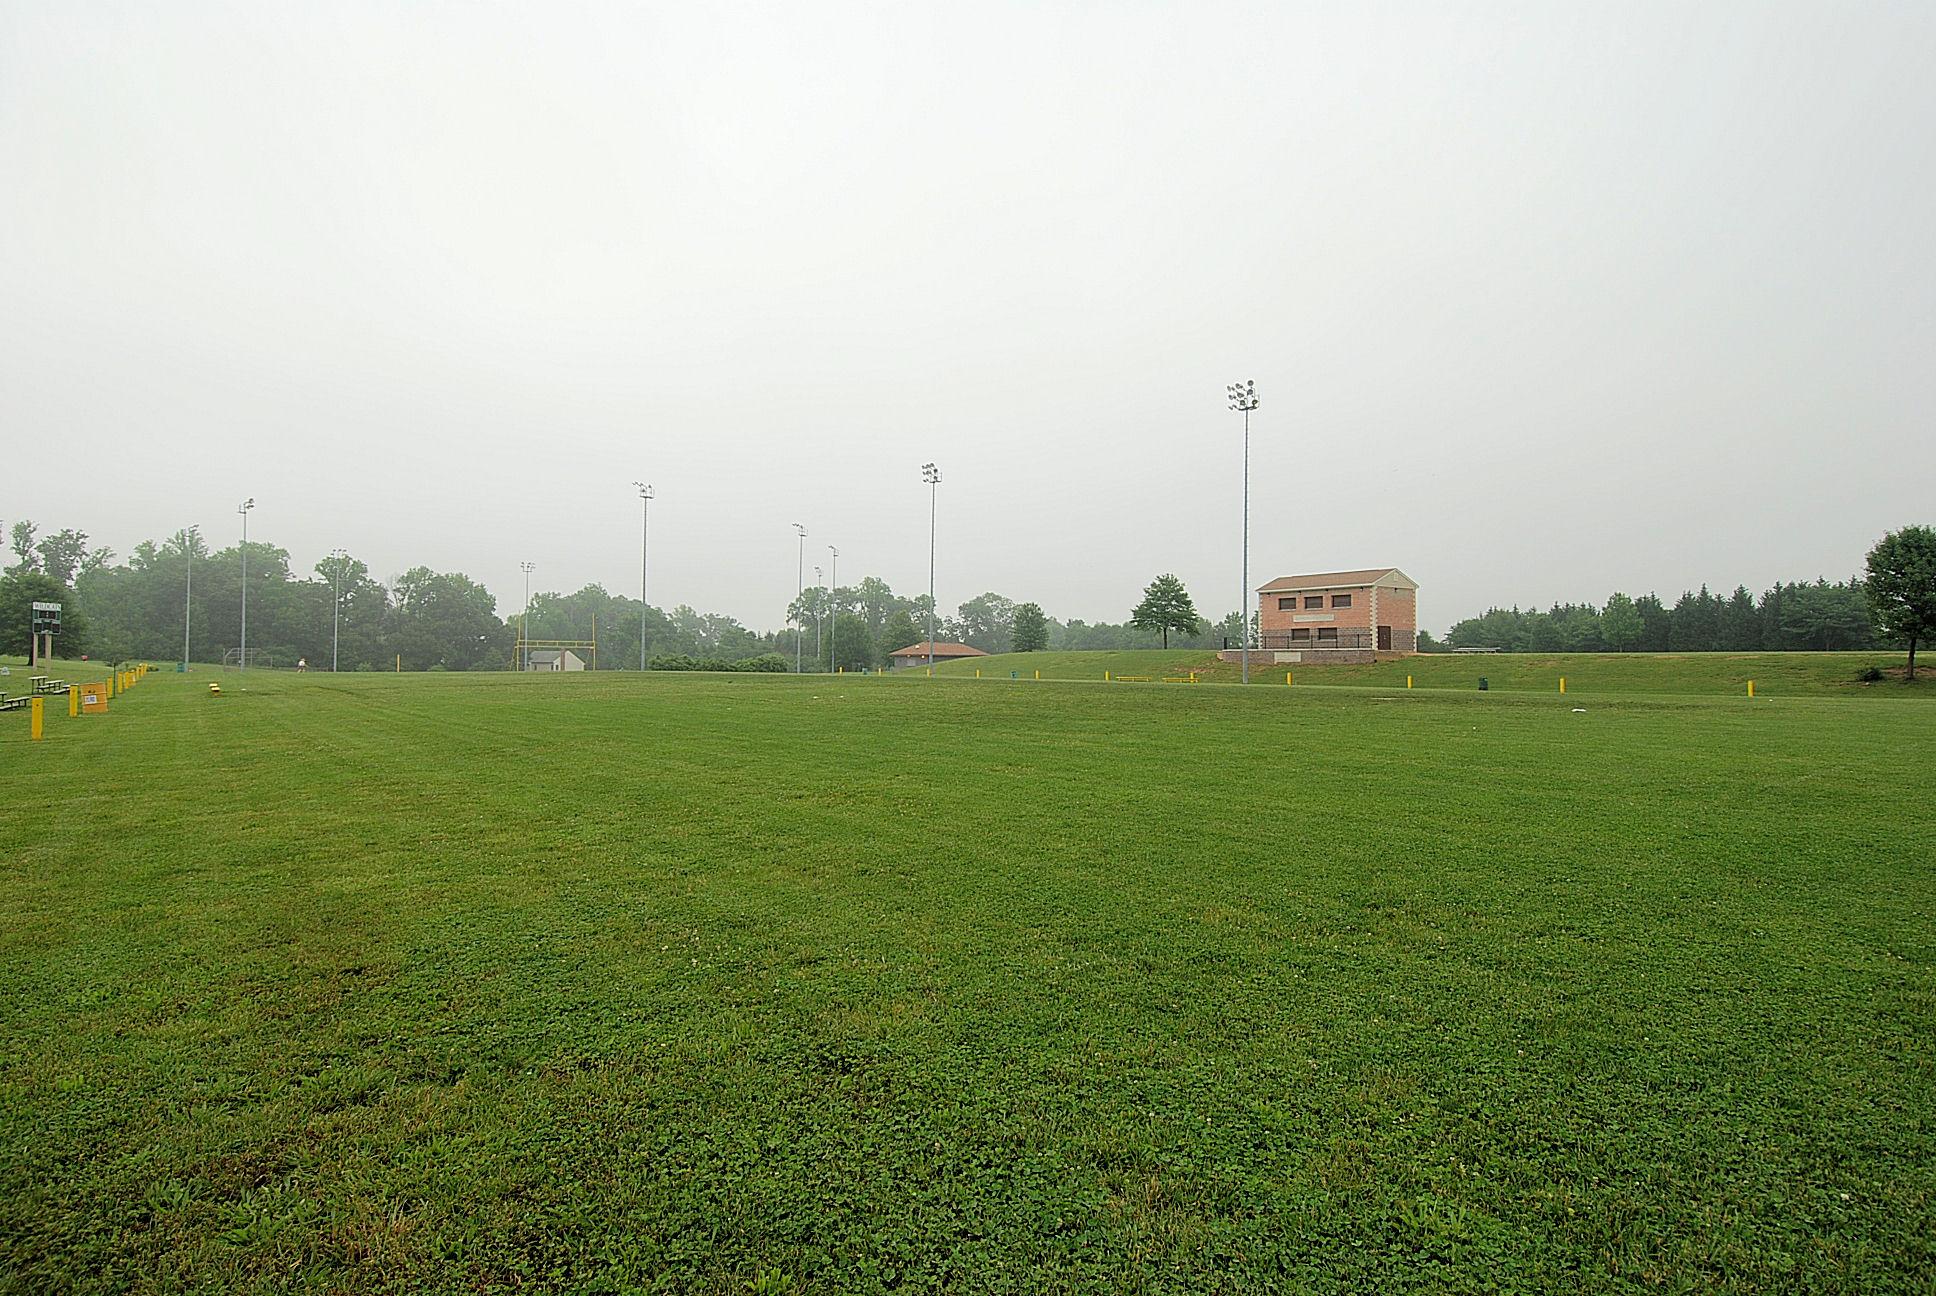 Piney Orchard football field